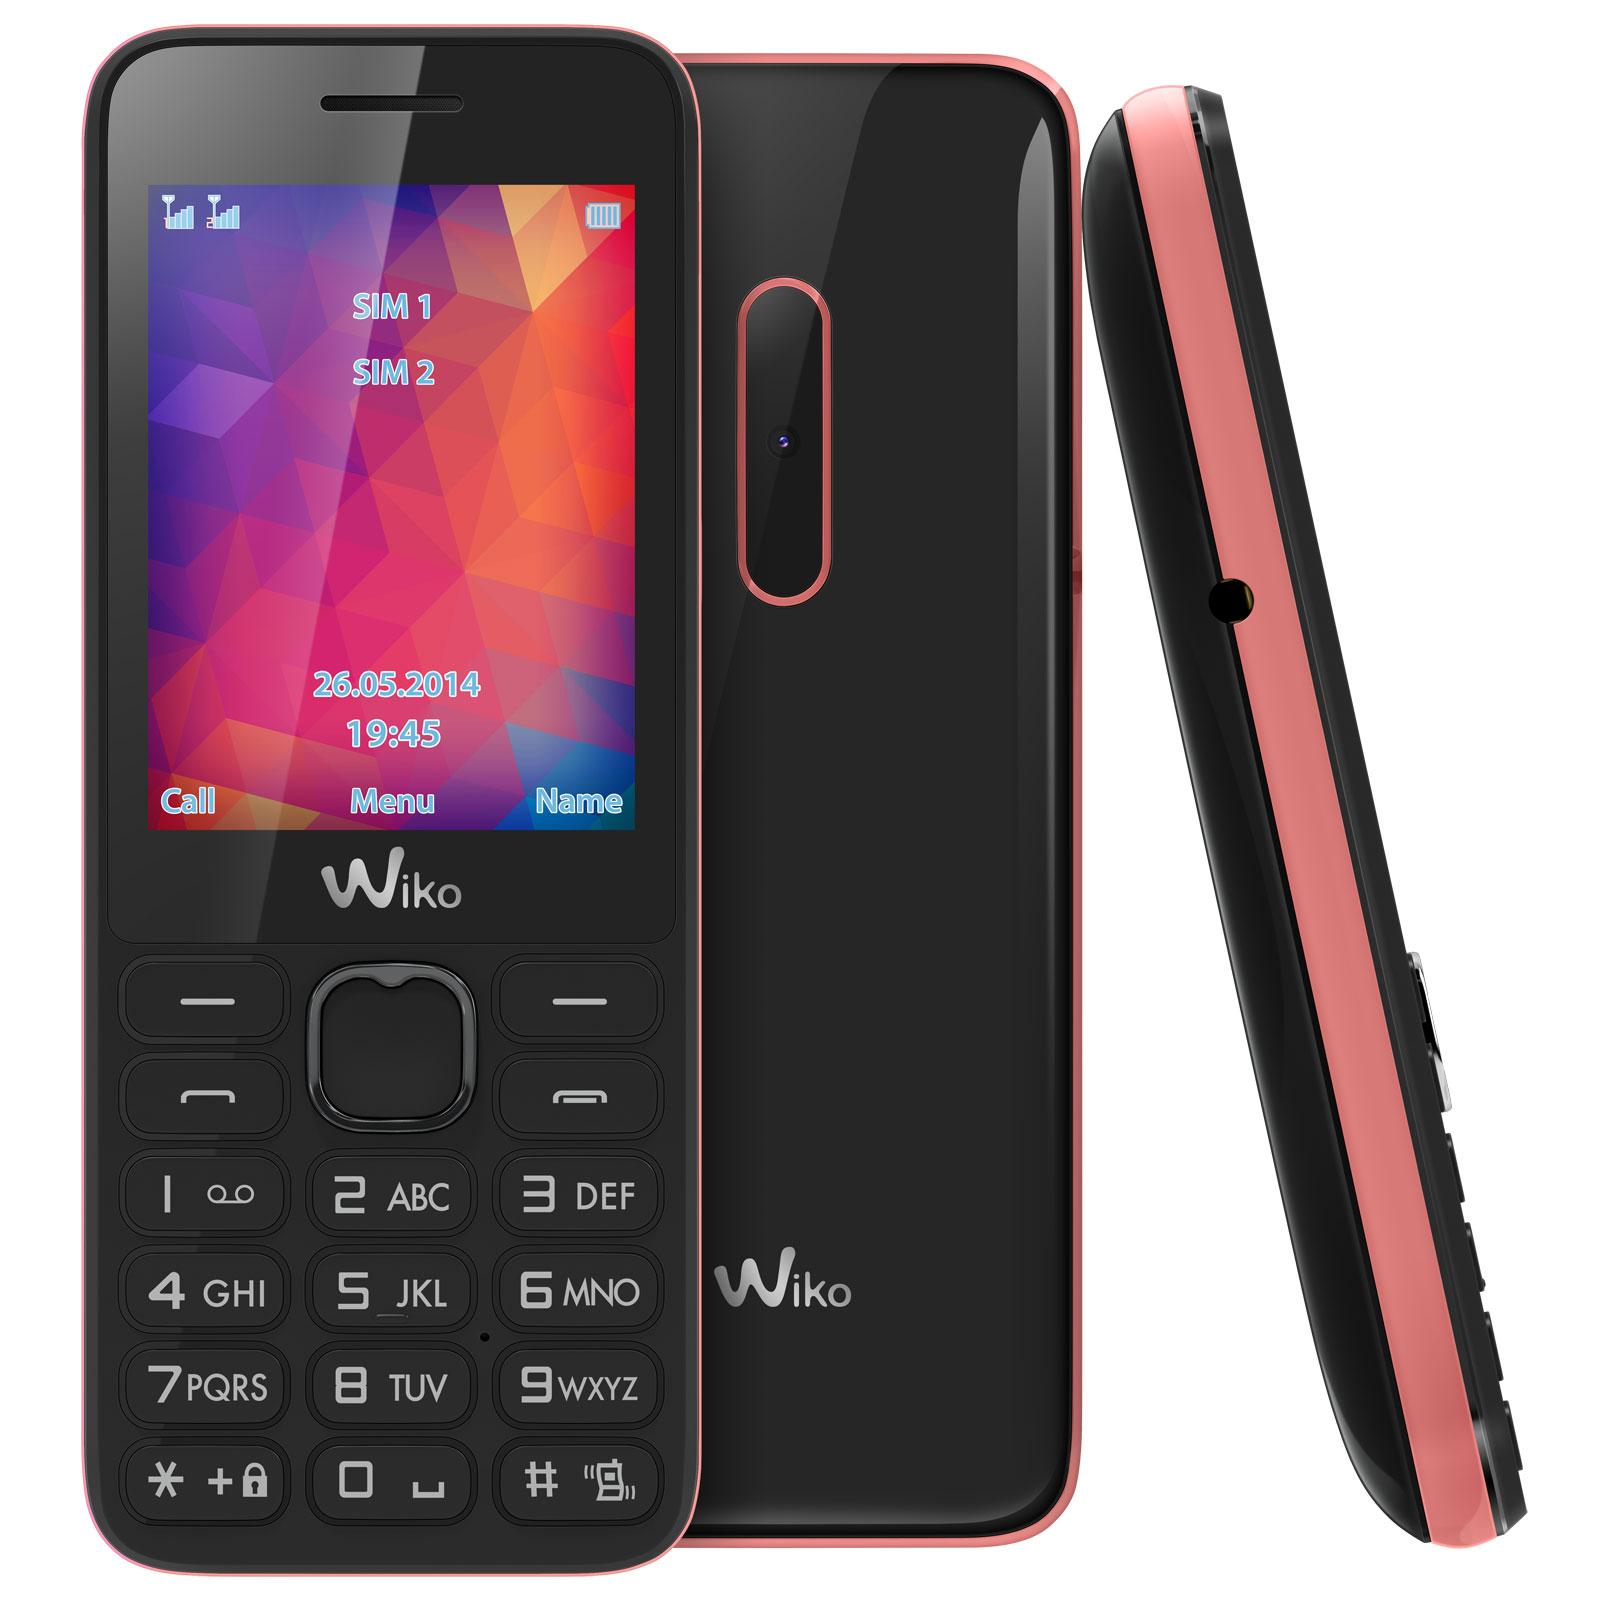 wiko riff 2 noir rose mobile smartphone wiko sur ldlc. Black Bedroom Furniture Sets. Home Design Ideas